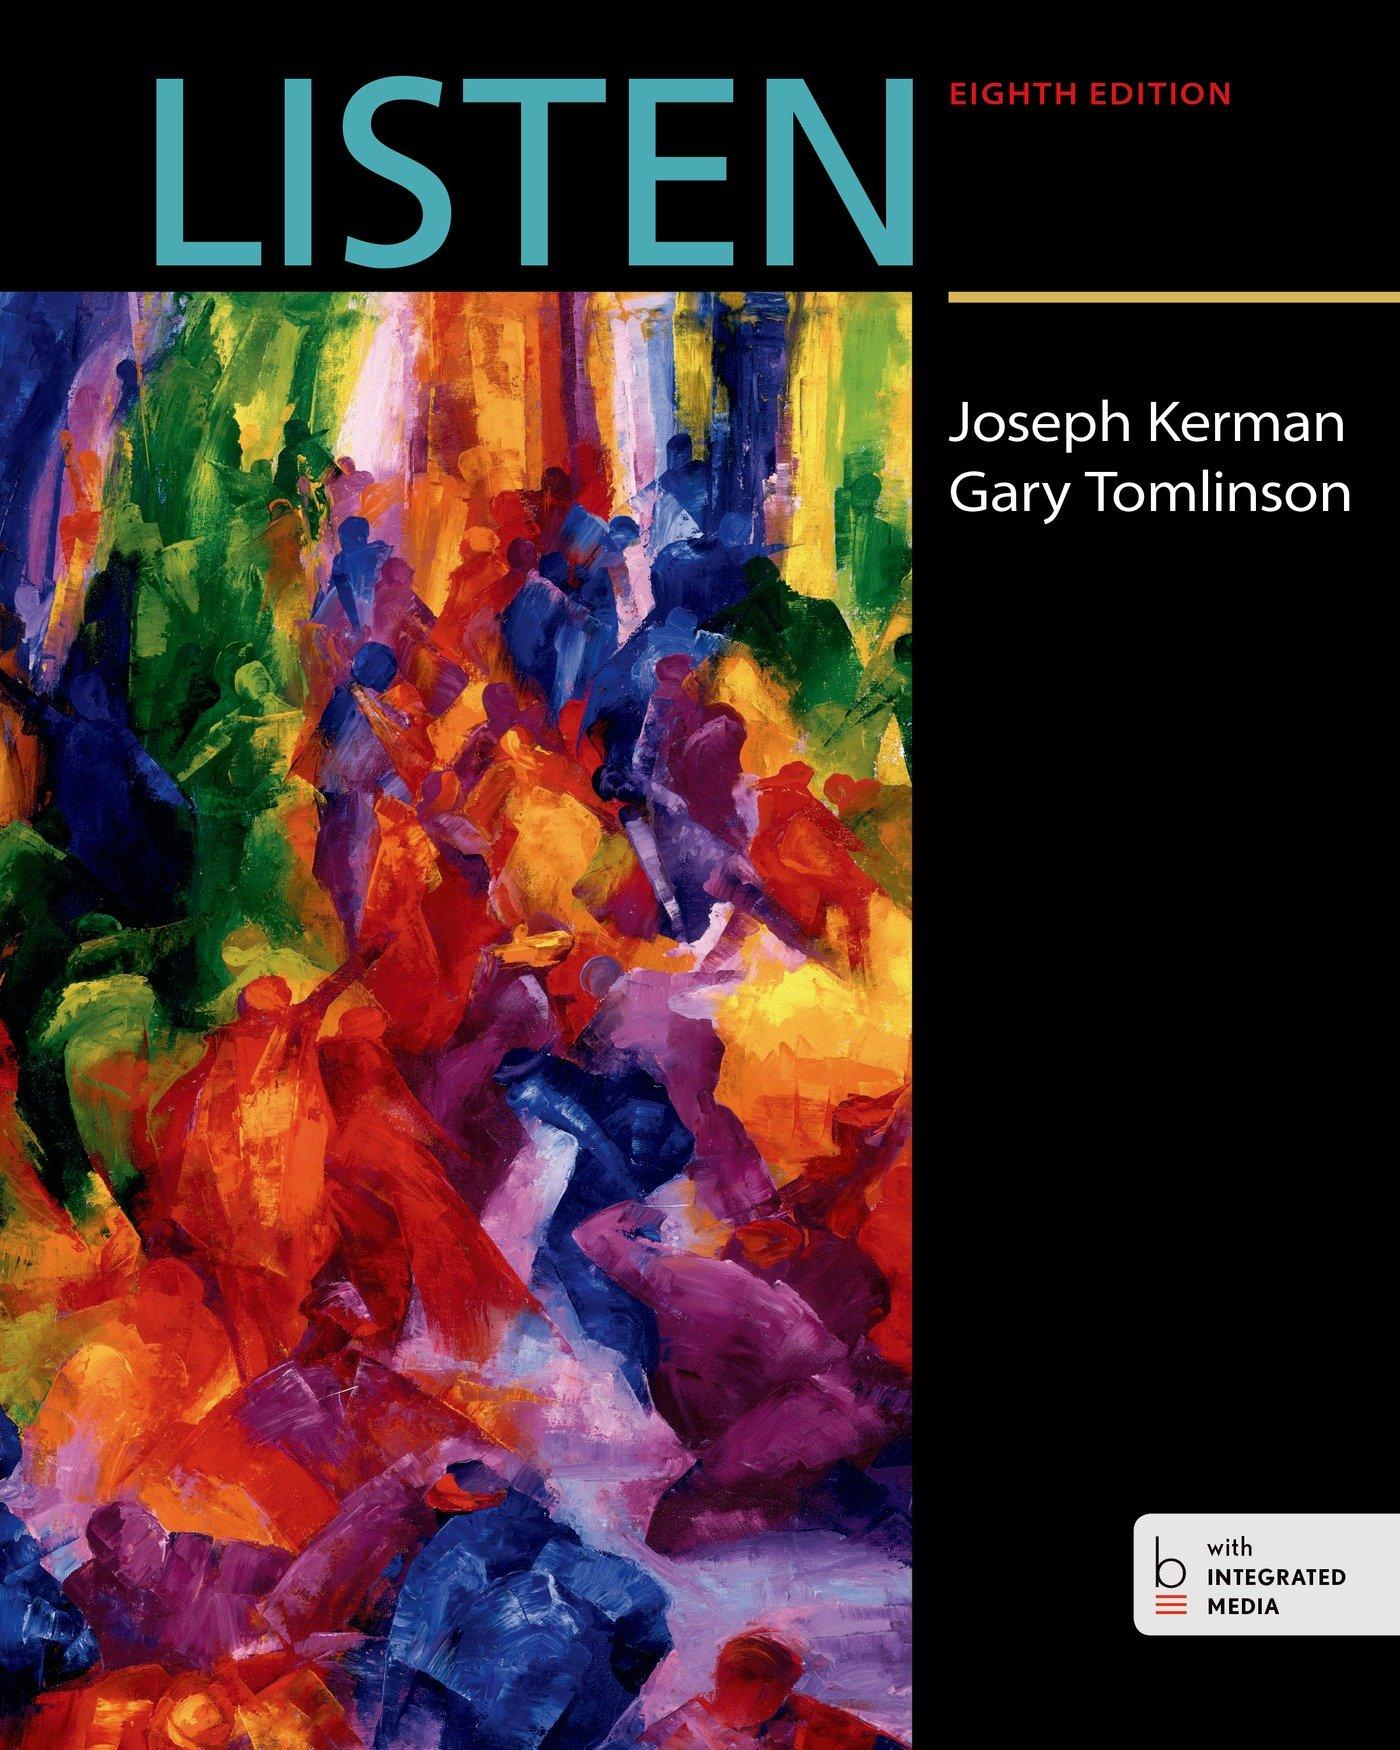 Listen professor of music joseph kerman university gary tomlinson listen professor of music joseph kerman university gary tomlinson 9781457669859 music amazon canada fandeluxe Images